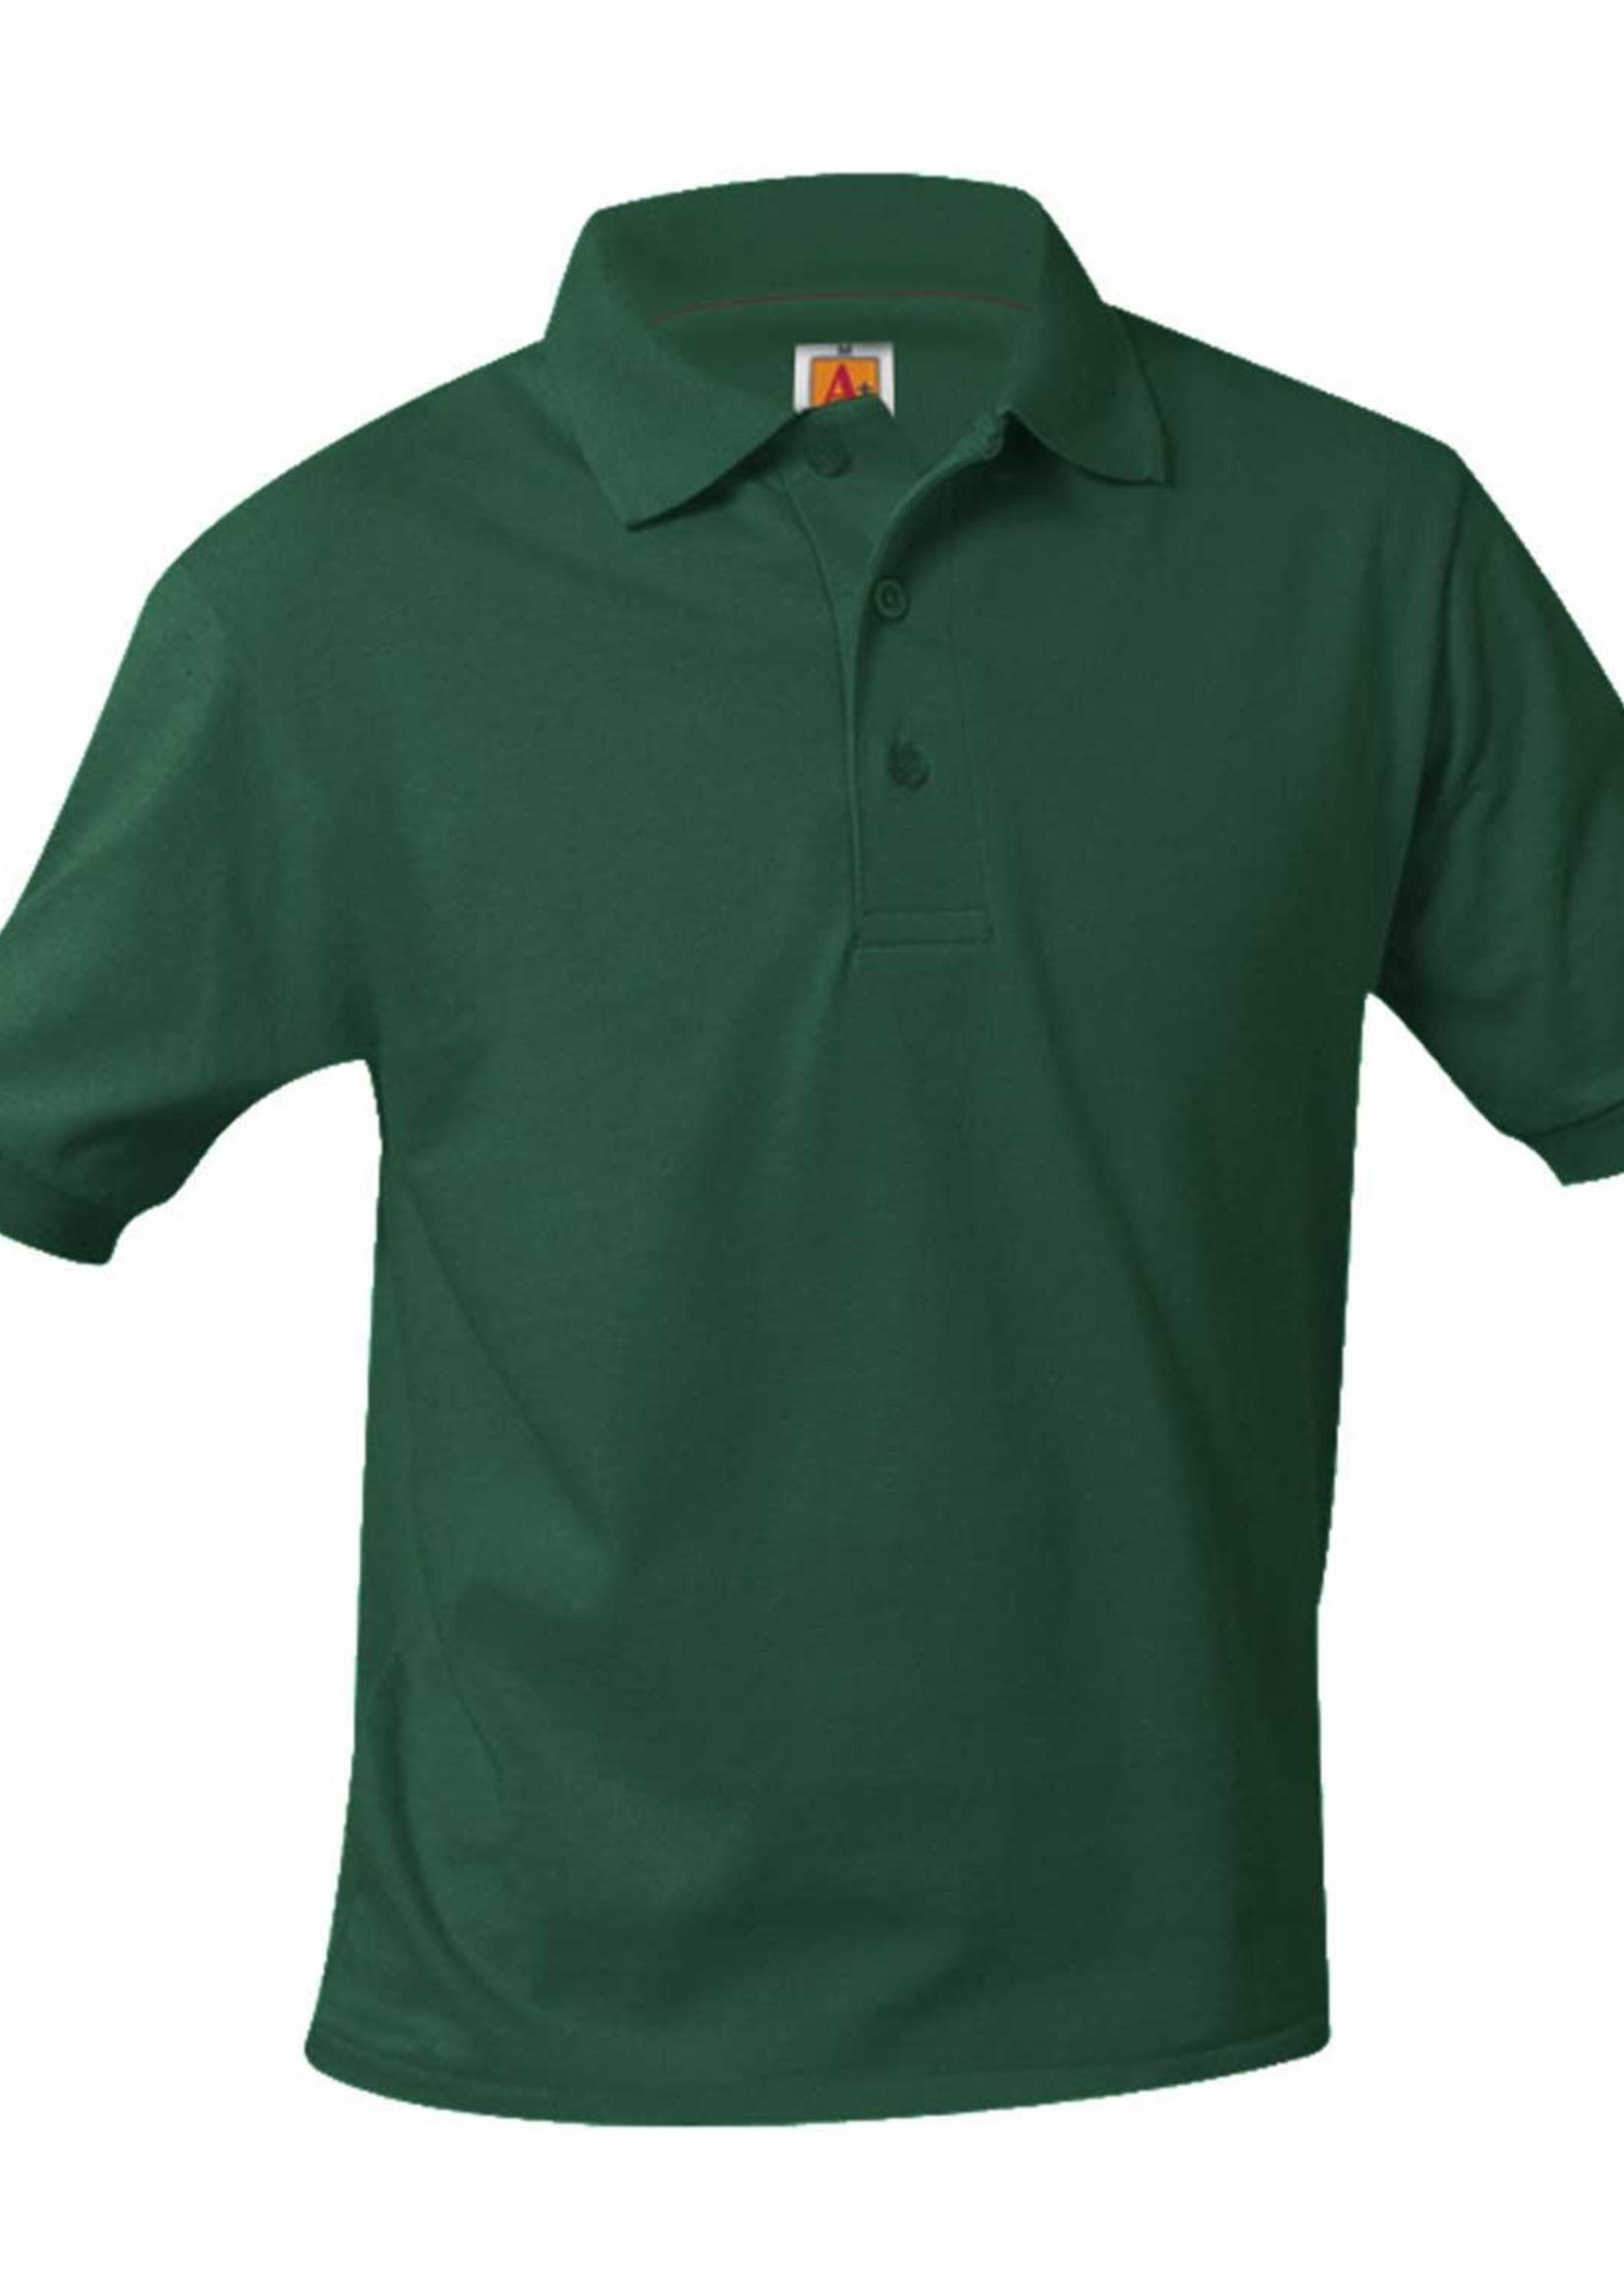 A+ SJC Forest Short Sleeve Jersey Polo